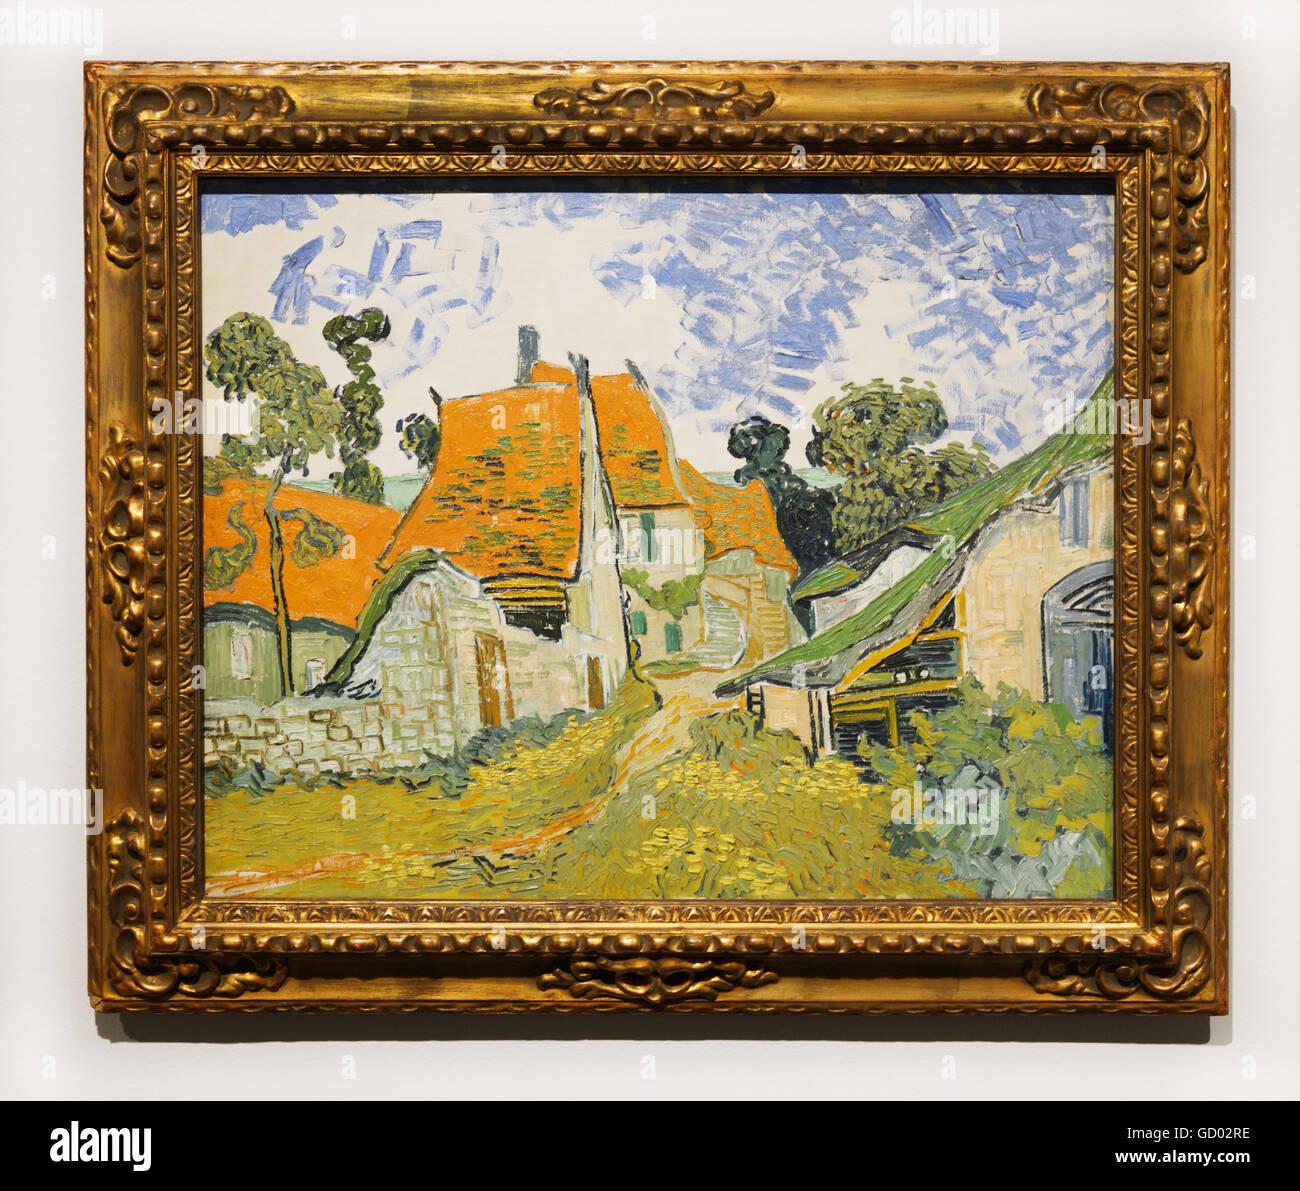 Van Gogh On Wall Stock Photos & Van Gogh On Wall Stock Images - Alamy